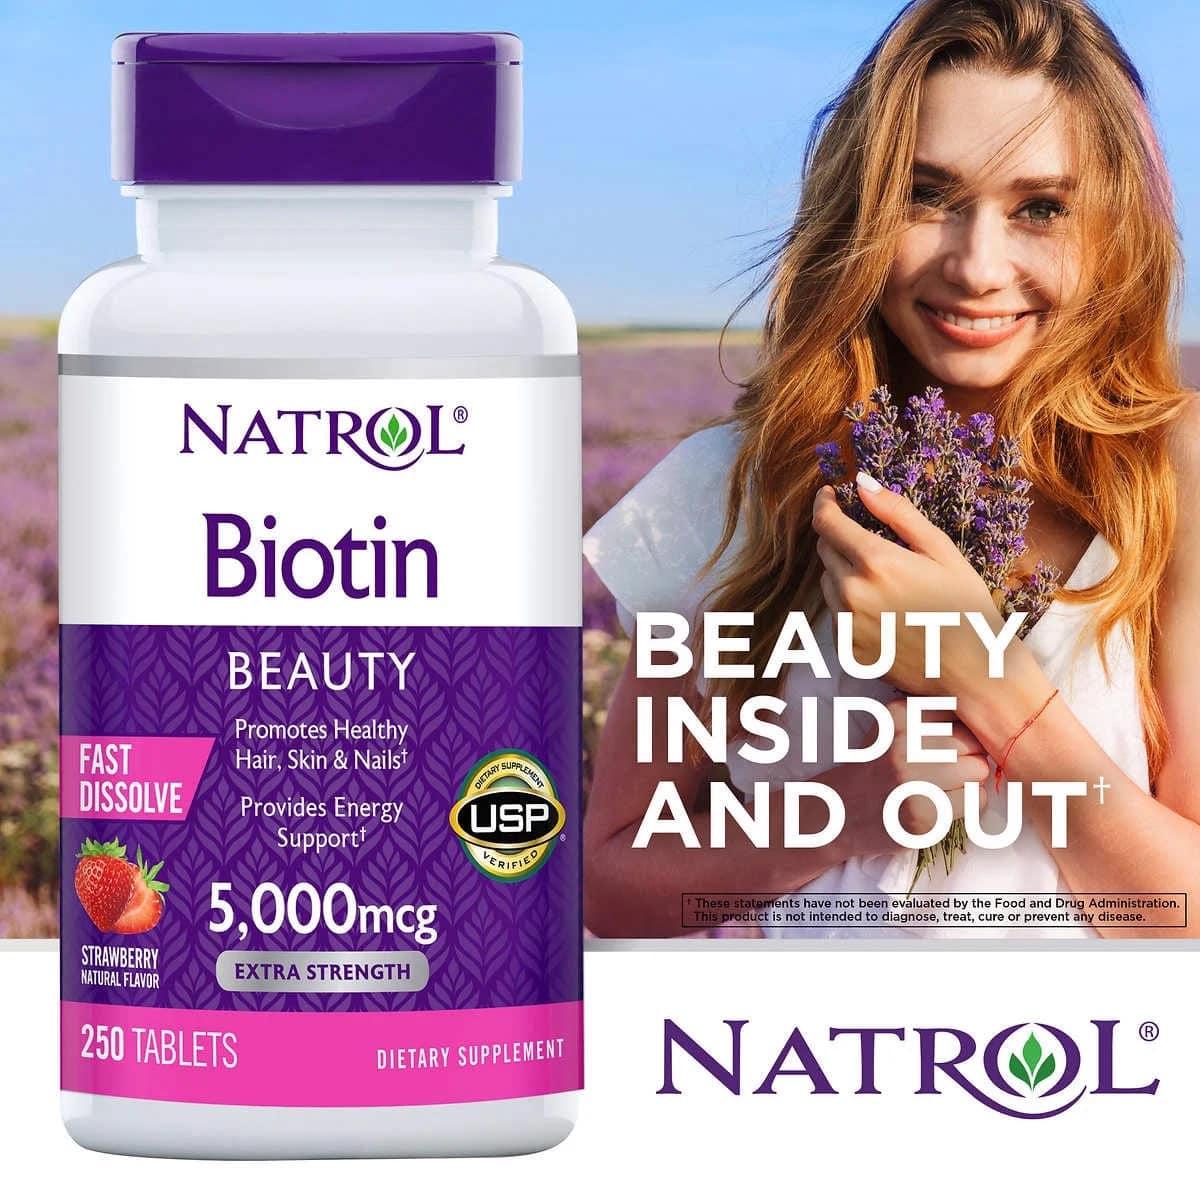 Natrol Biotin Beauty 5000mcg cua my